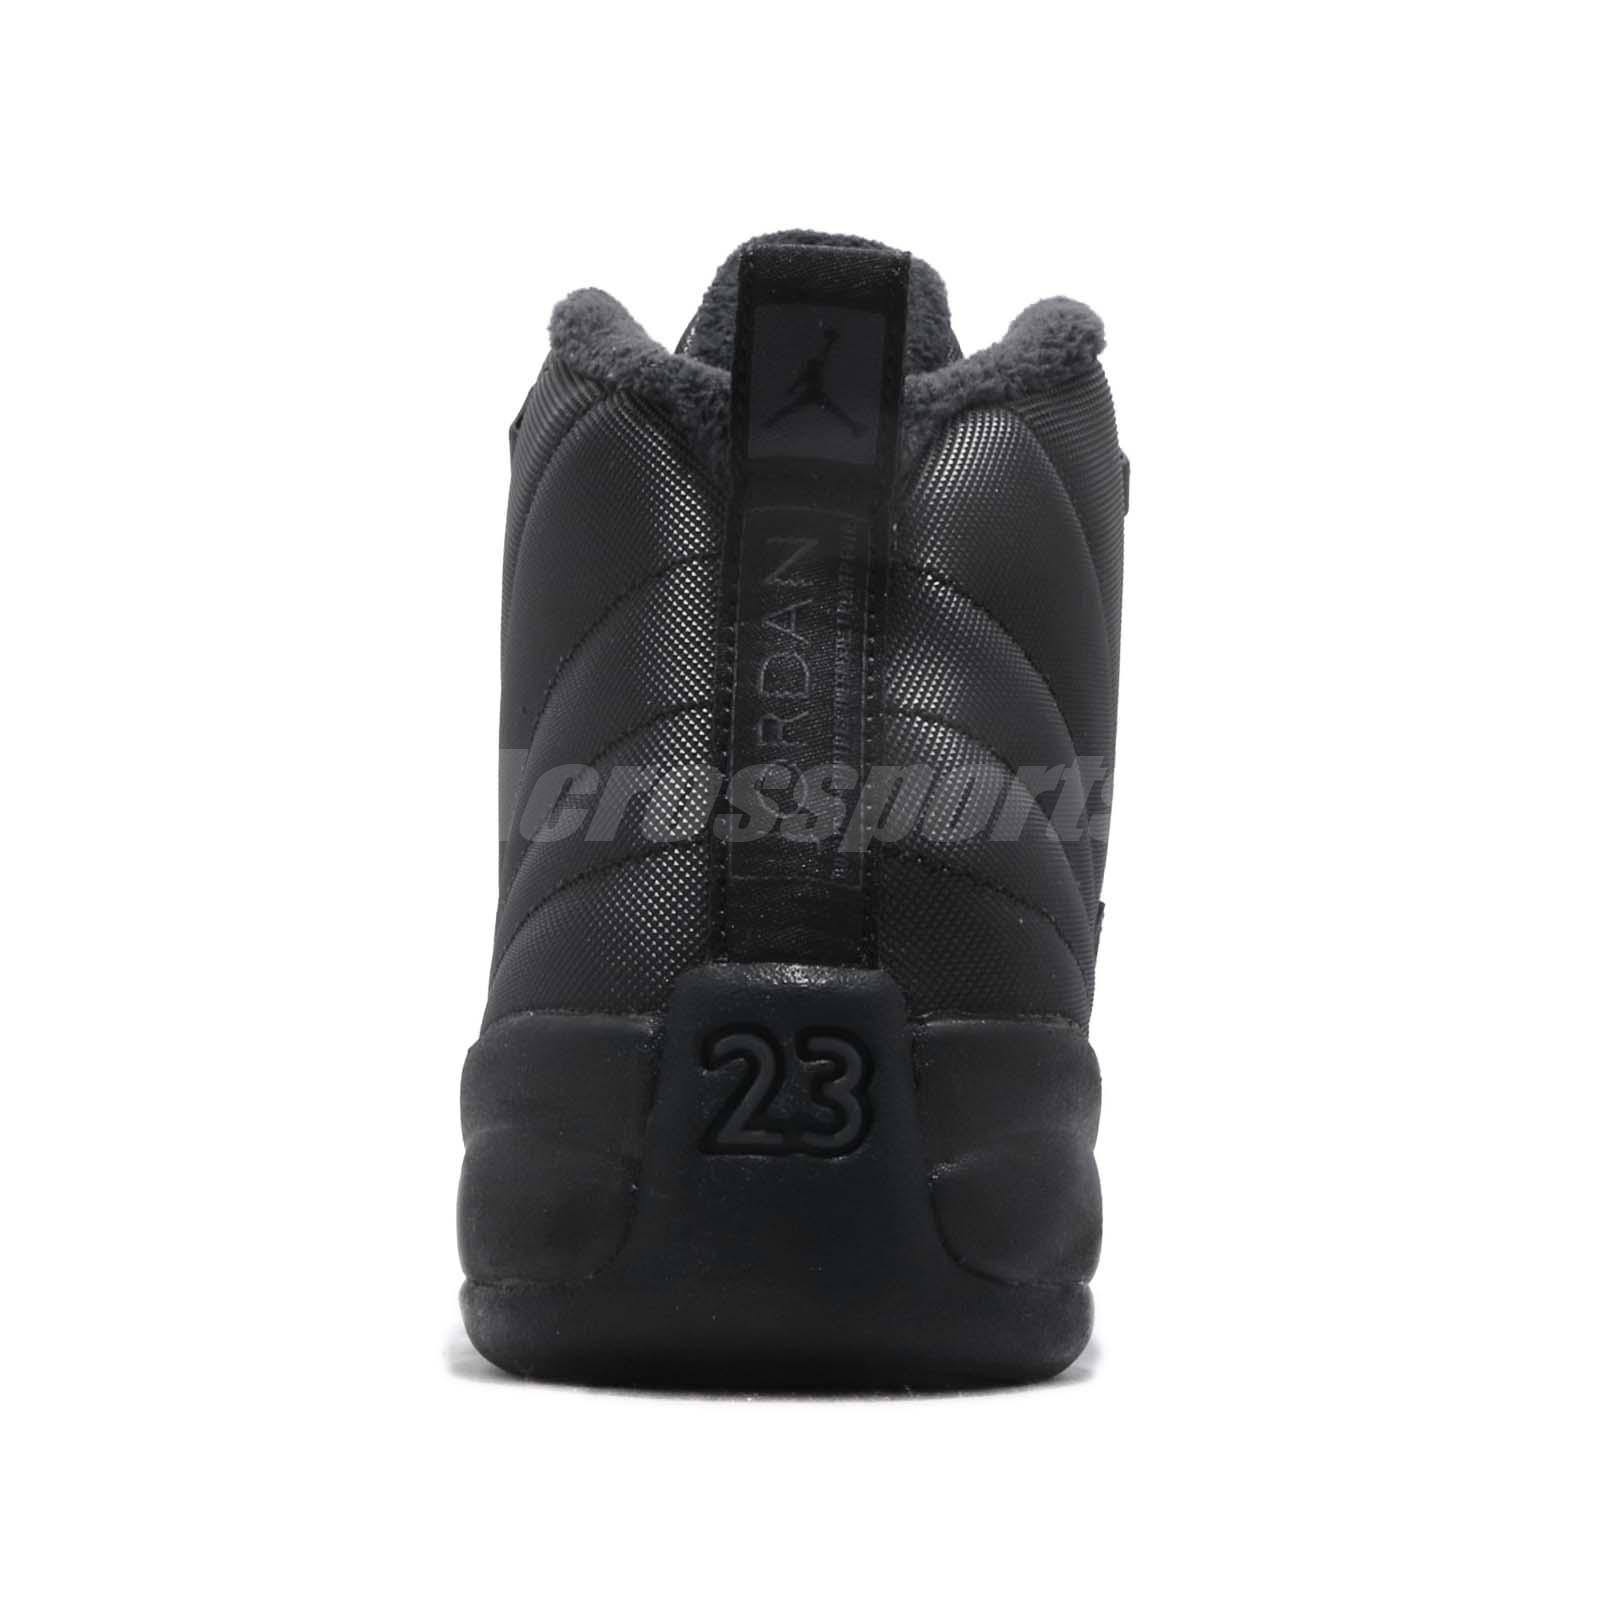 19dc429d6c4eb2 Nike Air Jordan 12 Retro WNTR GS AJ12 XII Winterized Black Kid Women ...